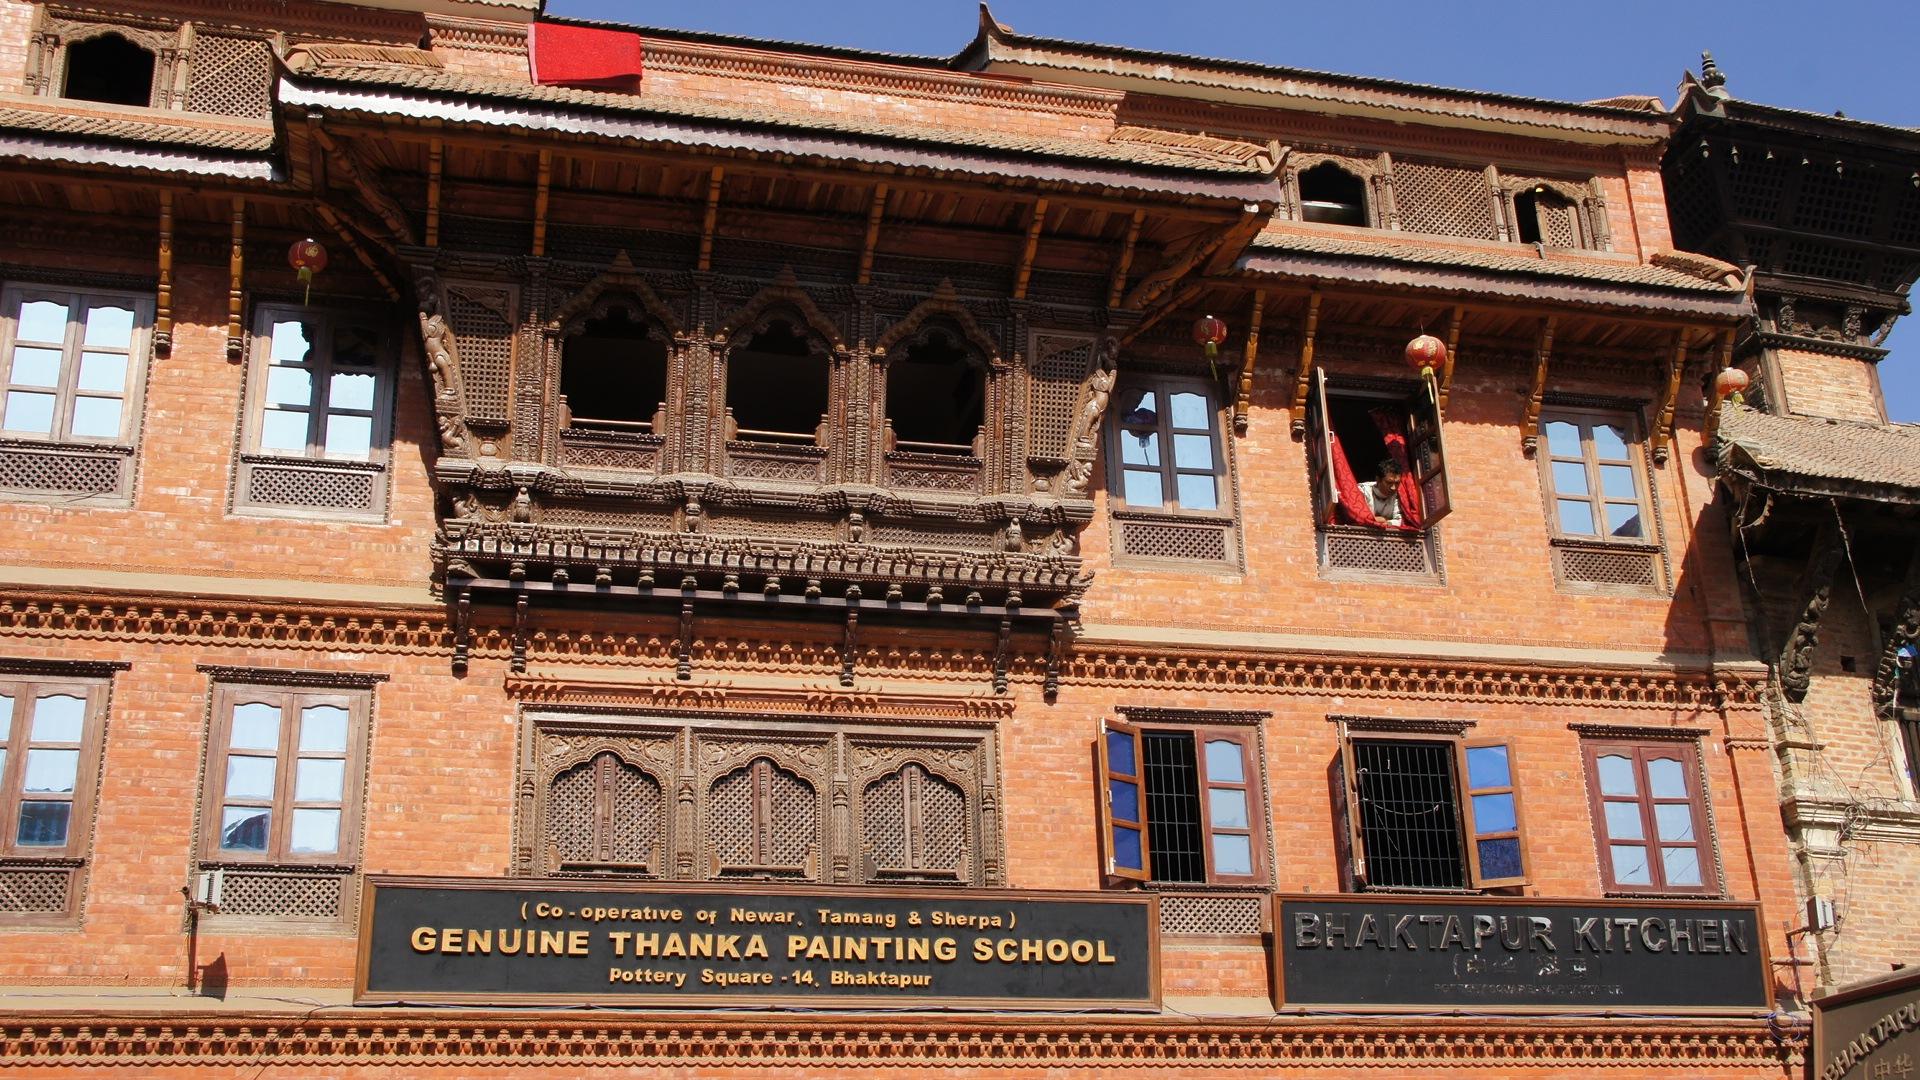 Ecole de peinture de tankas Bhaktapur Nepal